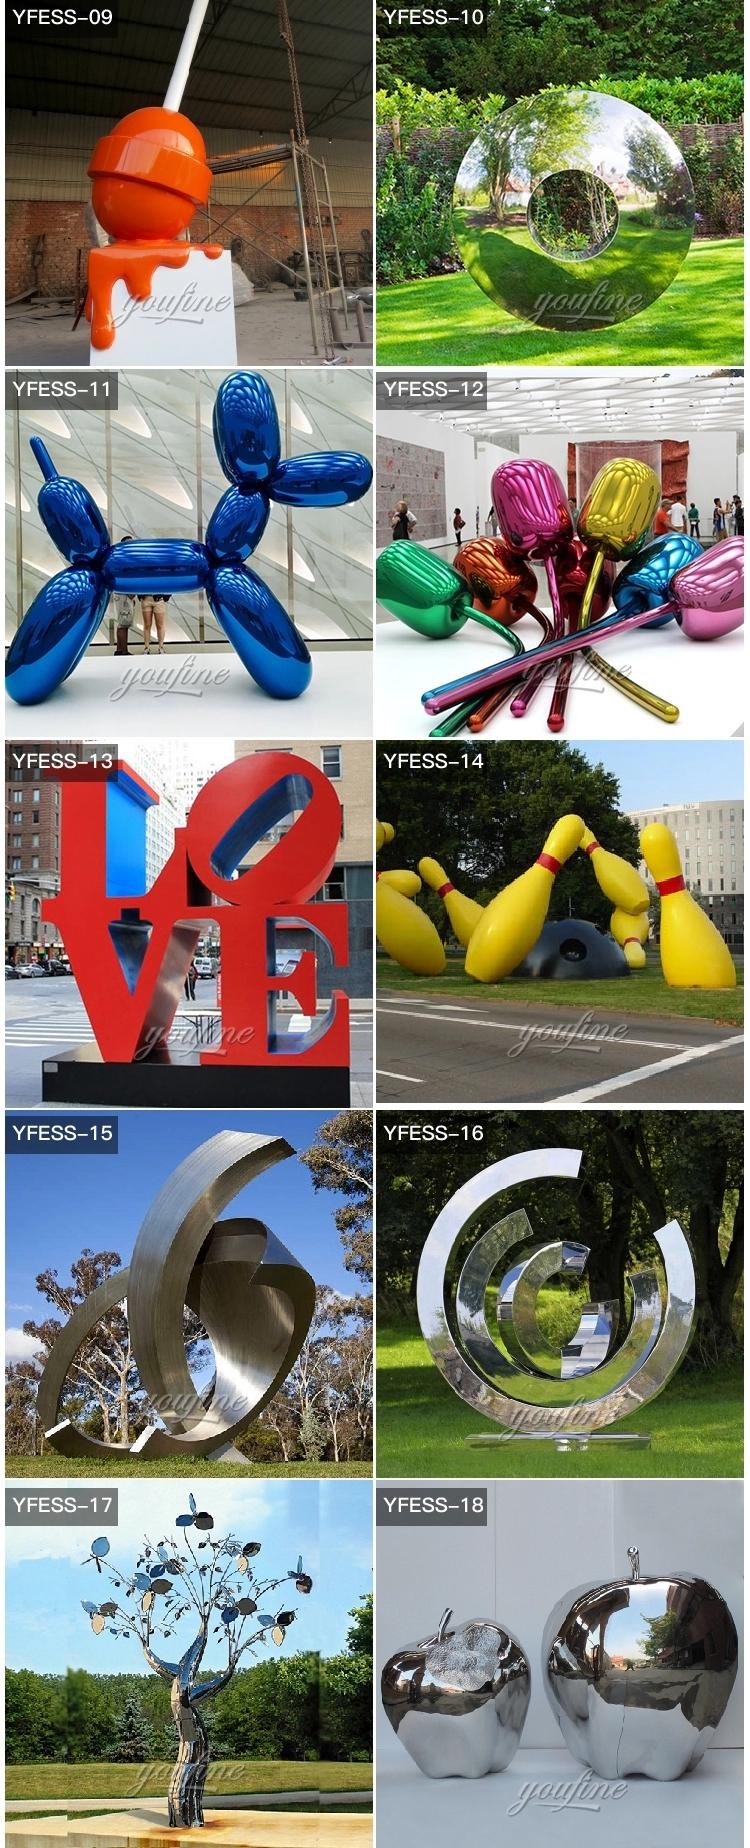 1IC18002 Modern Stainless Steel Sculpture Manufacturer (4)